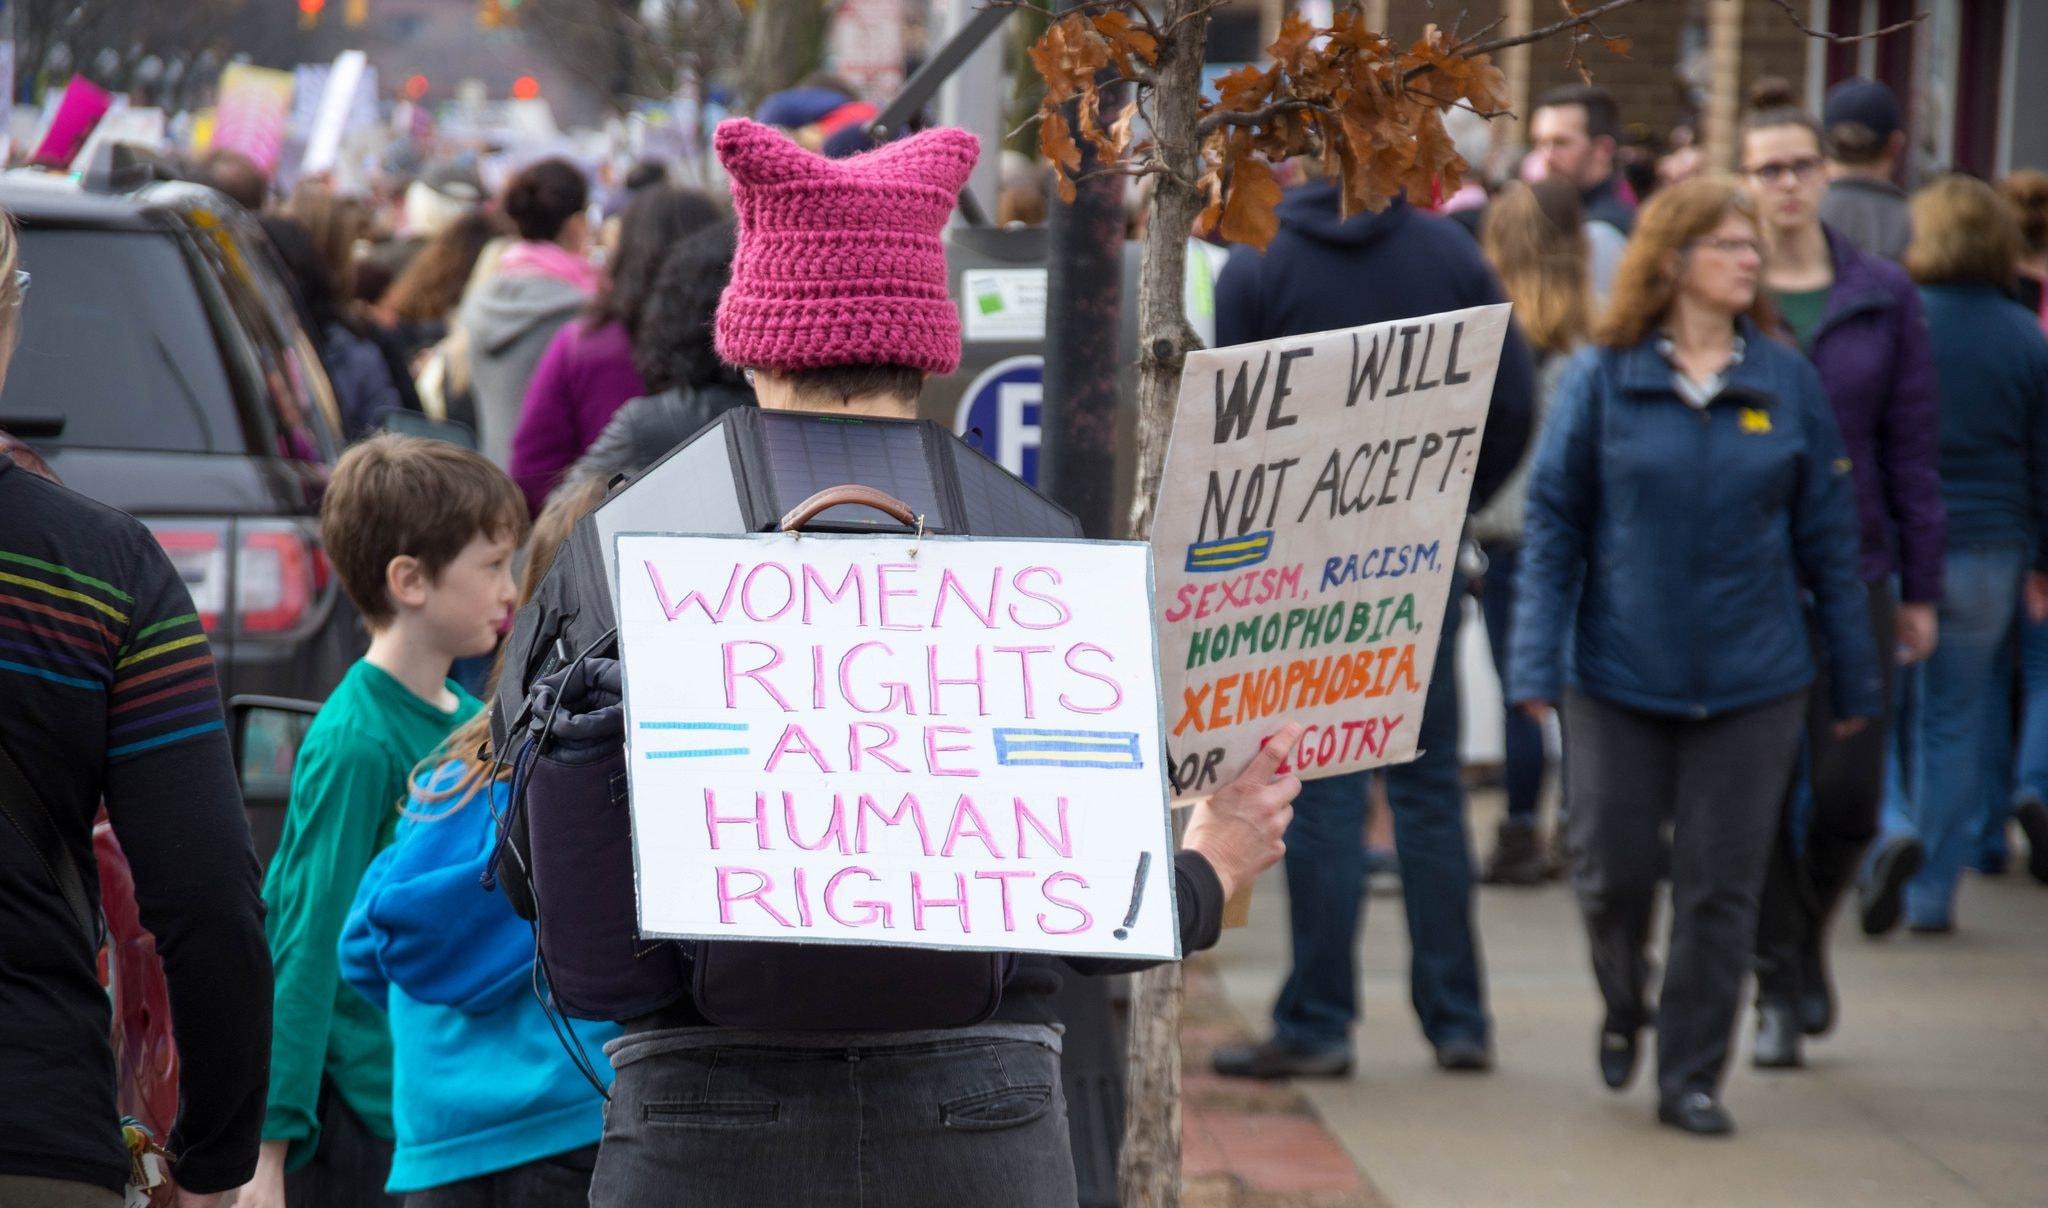 Protestors at the 2017 sister march in Ann Arbor, Michigan   © John C. Rivard/Flickr